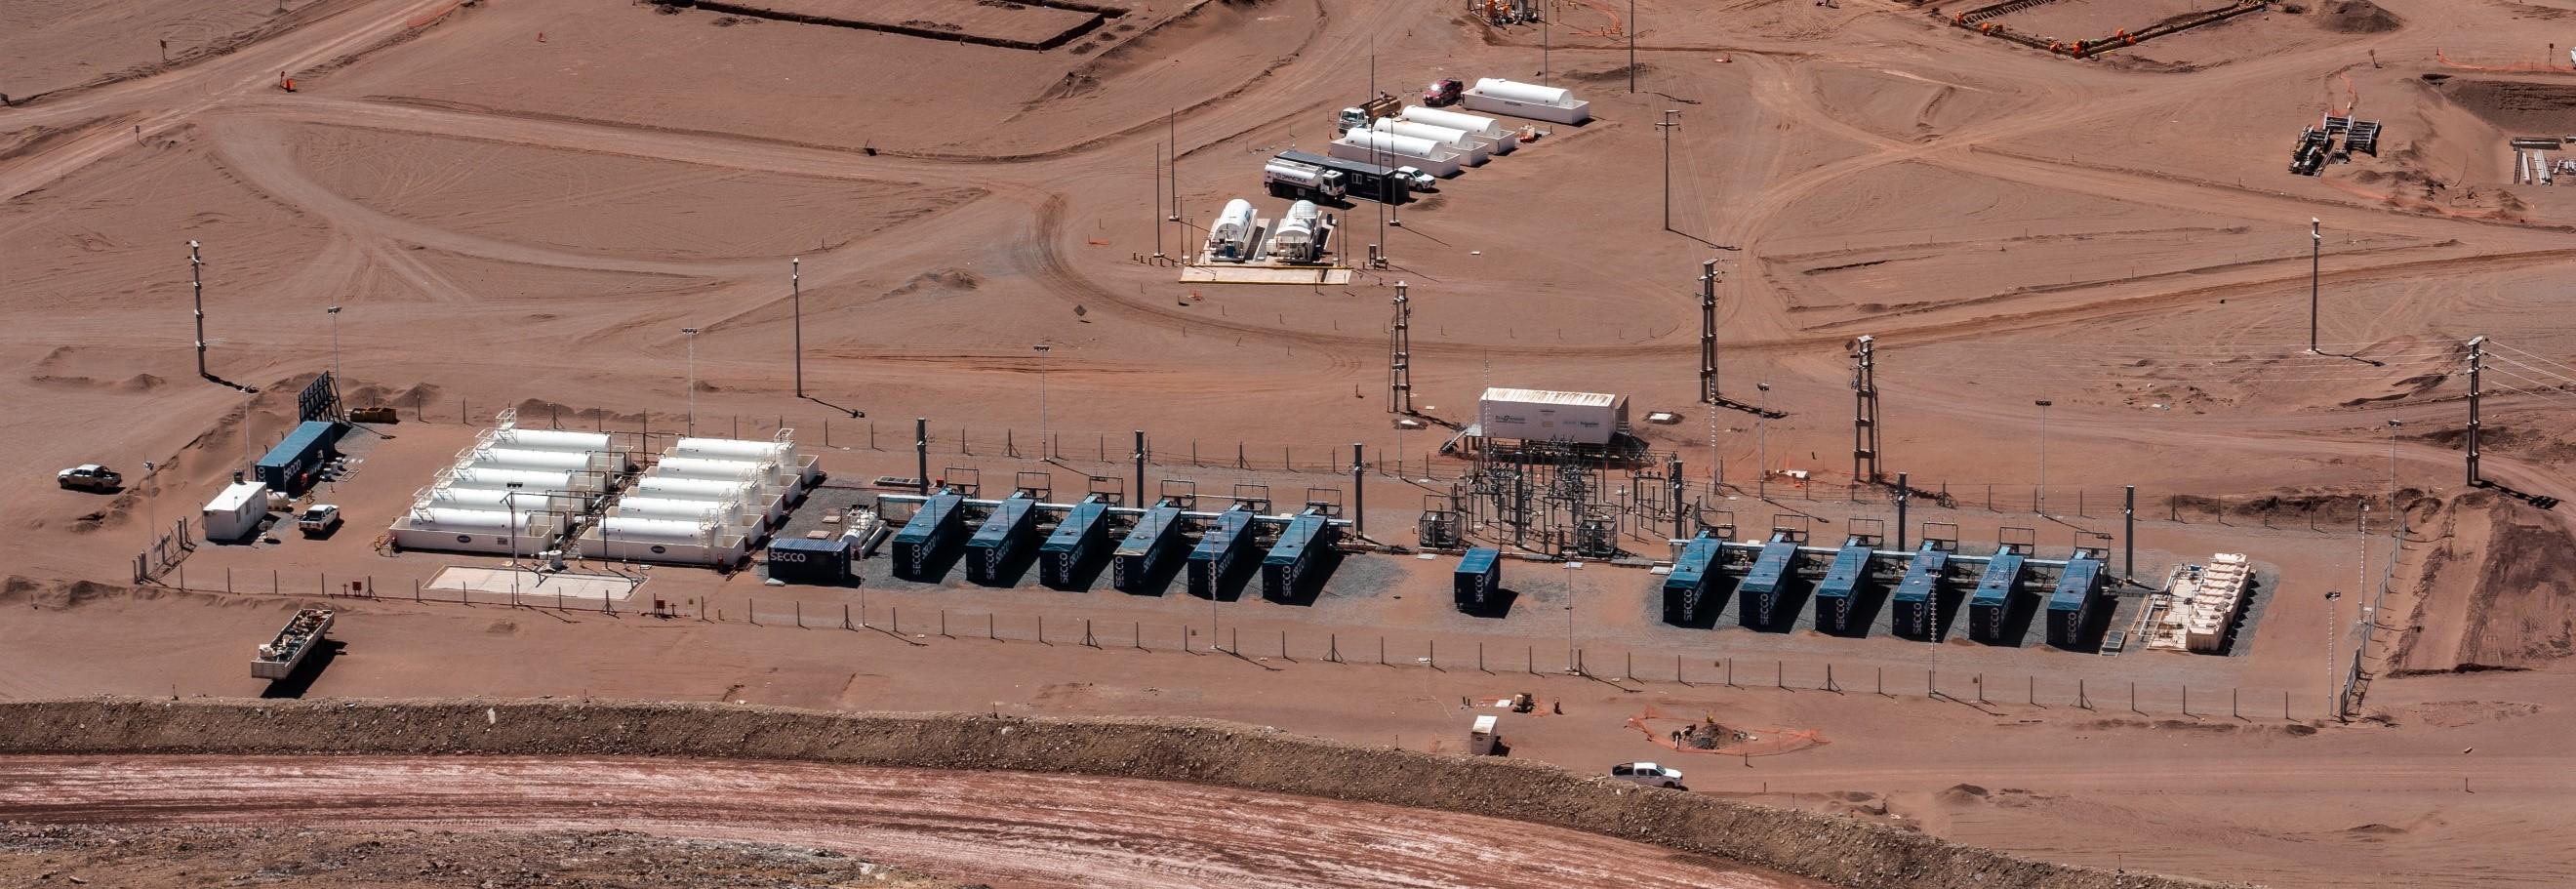 8 megawatt power plant